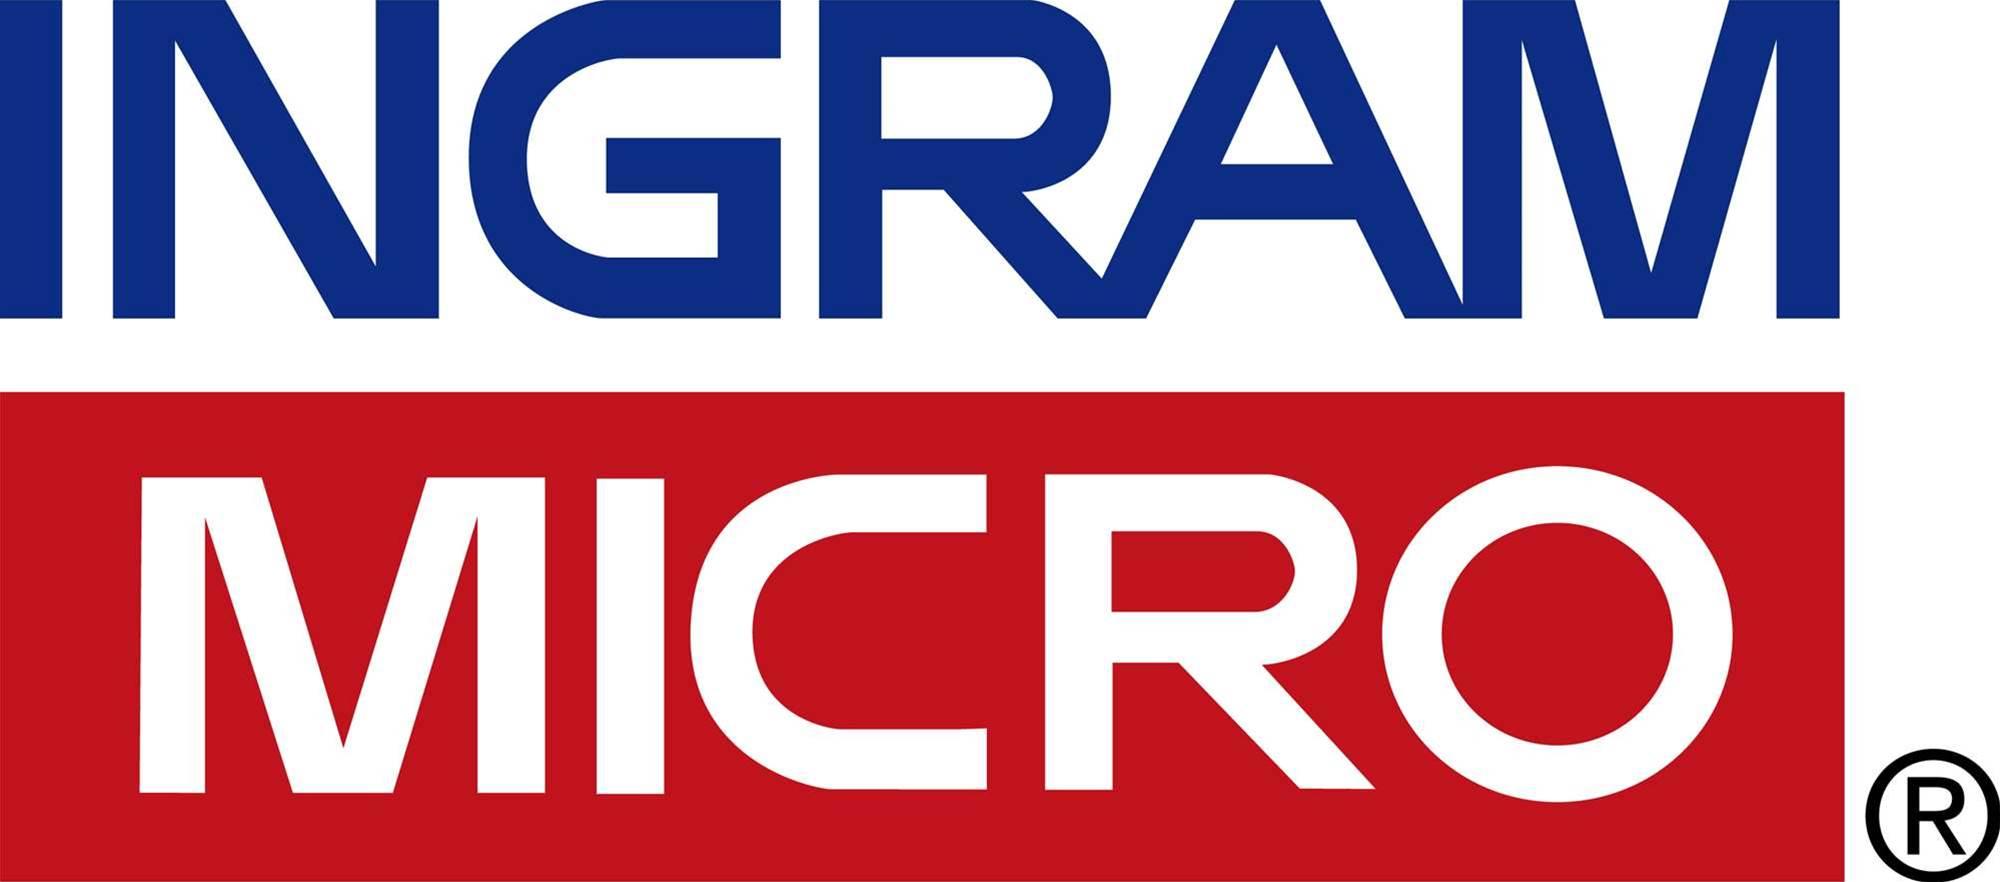 Ingram Micro announces executive reshuffle